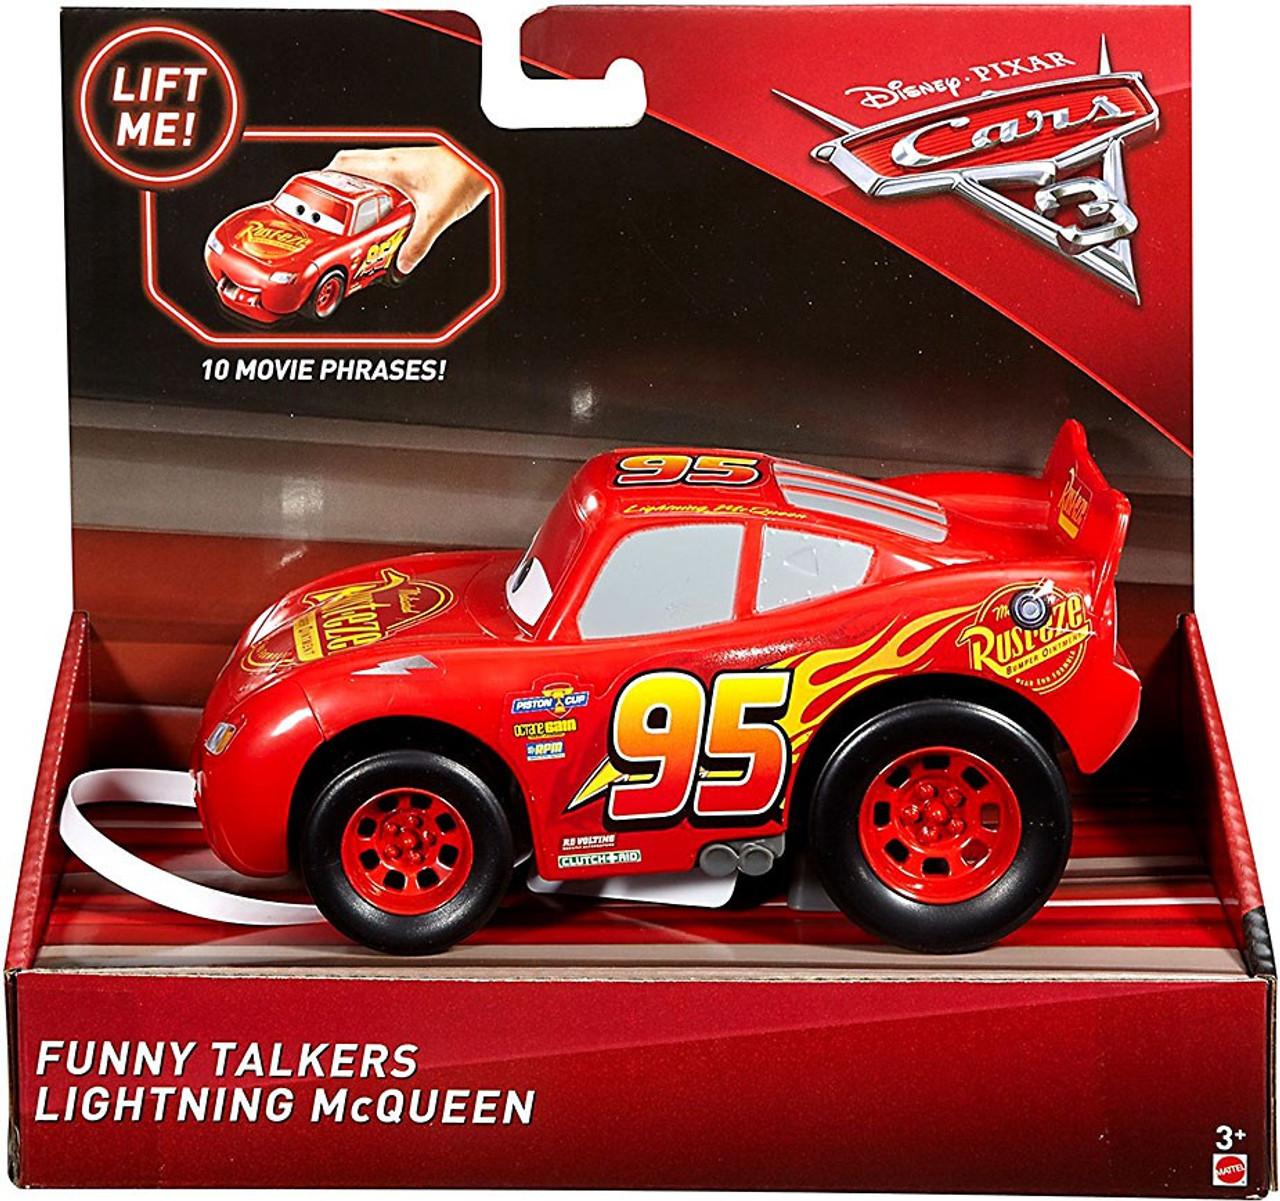 Disney Pixar Cars Cars 3 Funny Talkers Lightning Mcqueen Vehicle